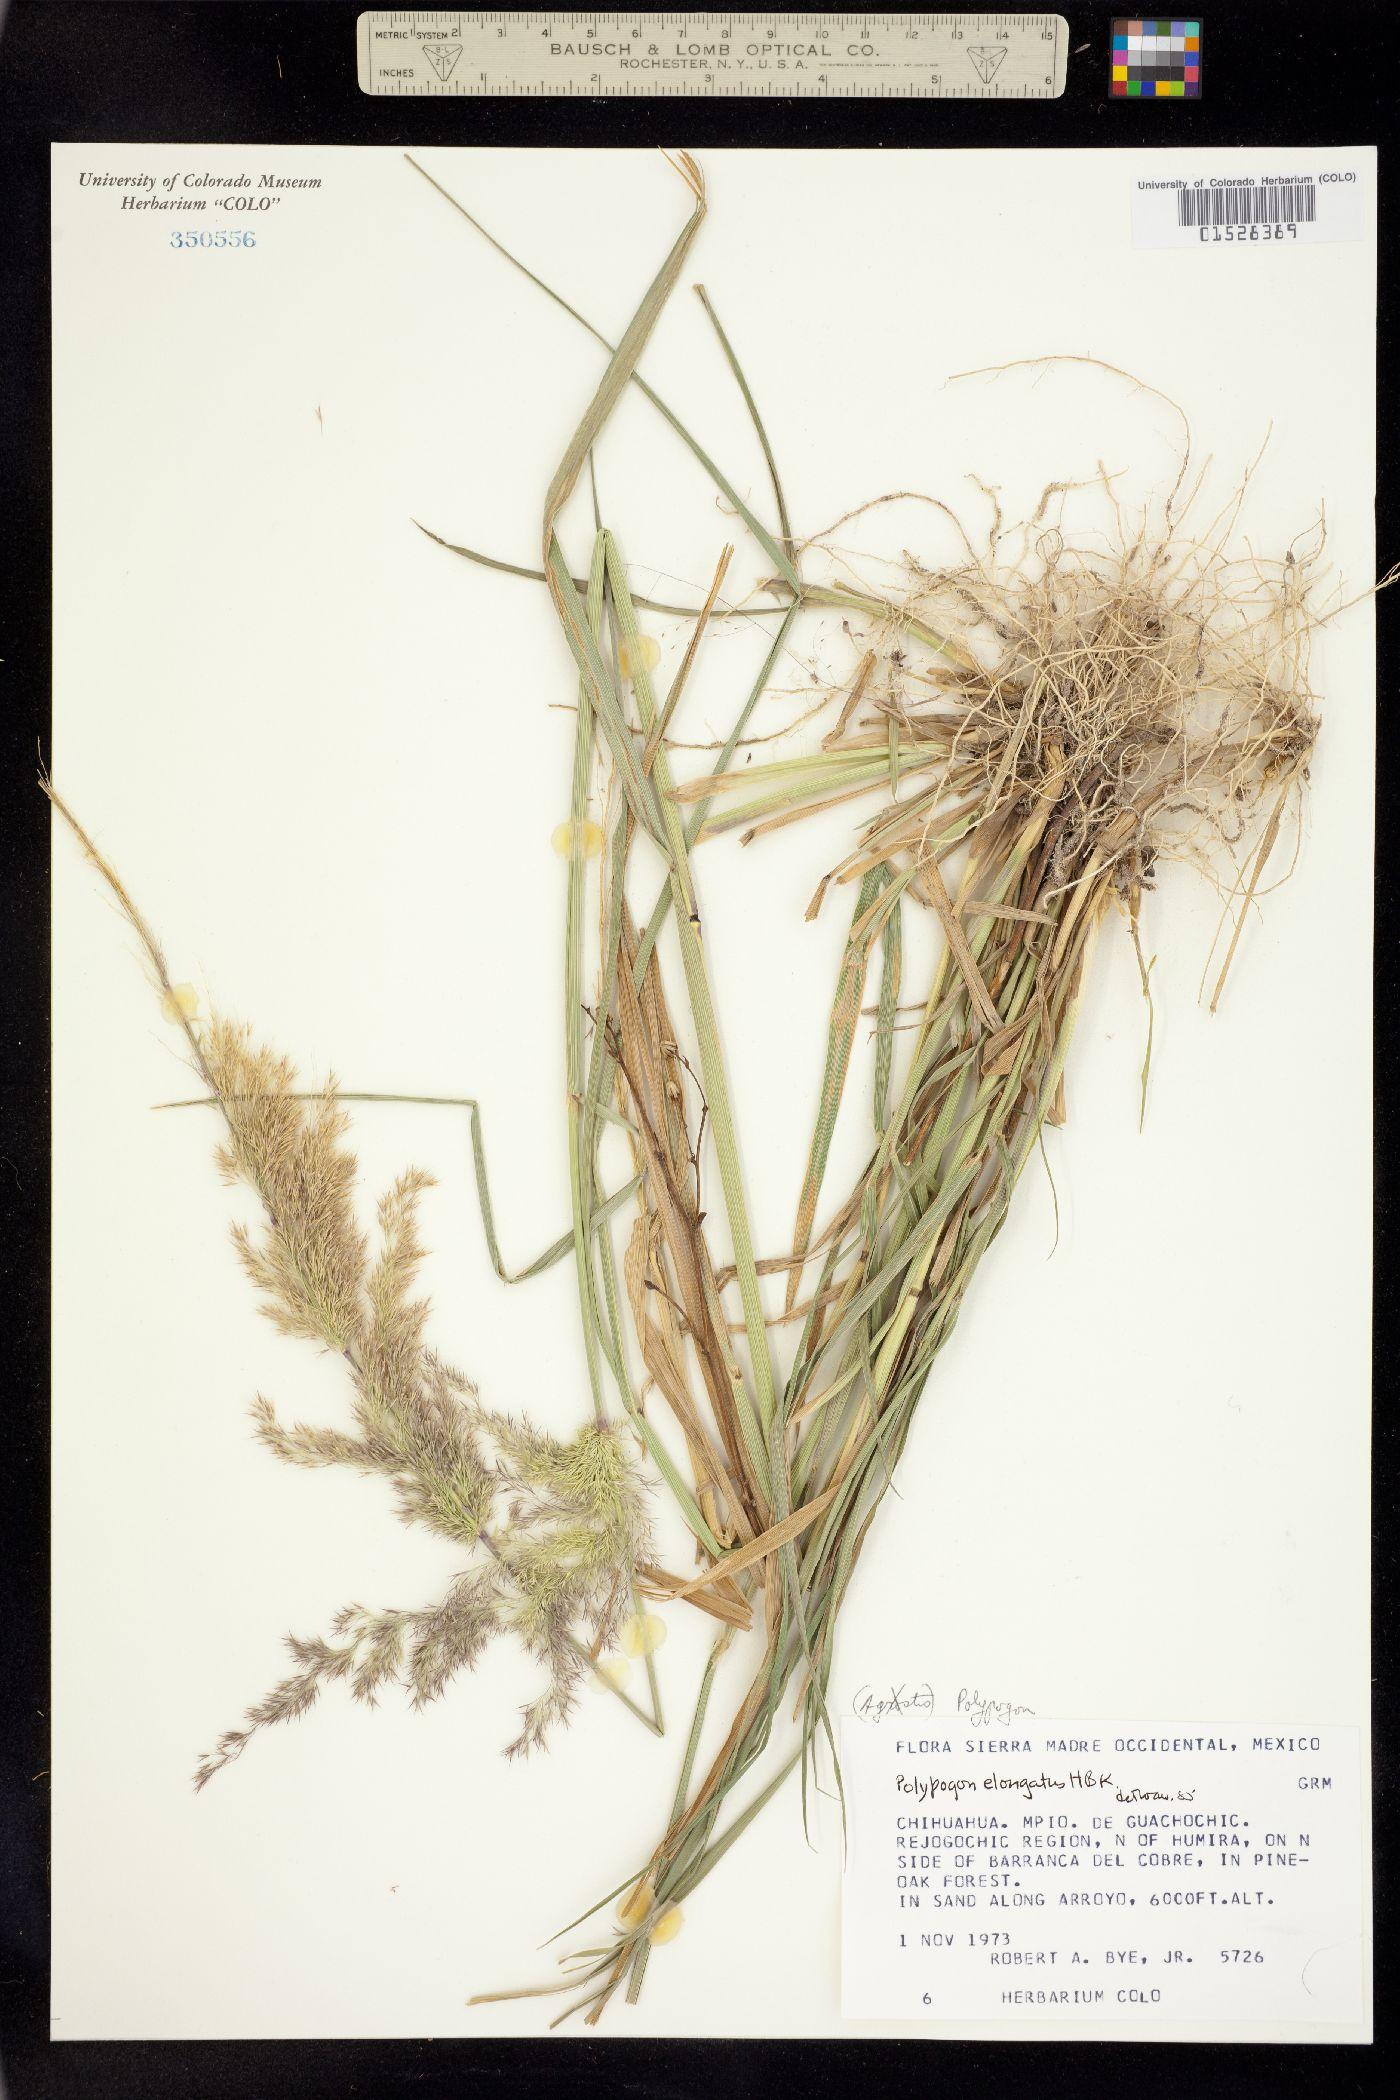 Polypogon image